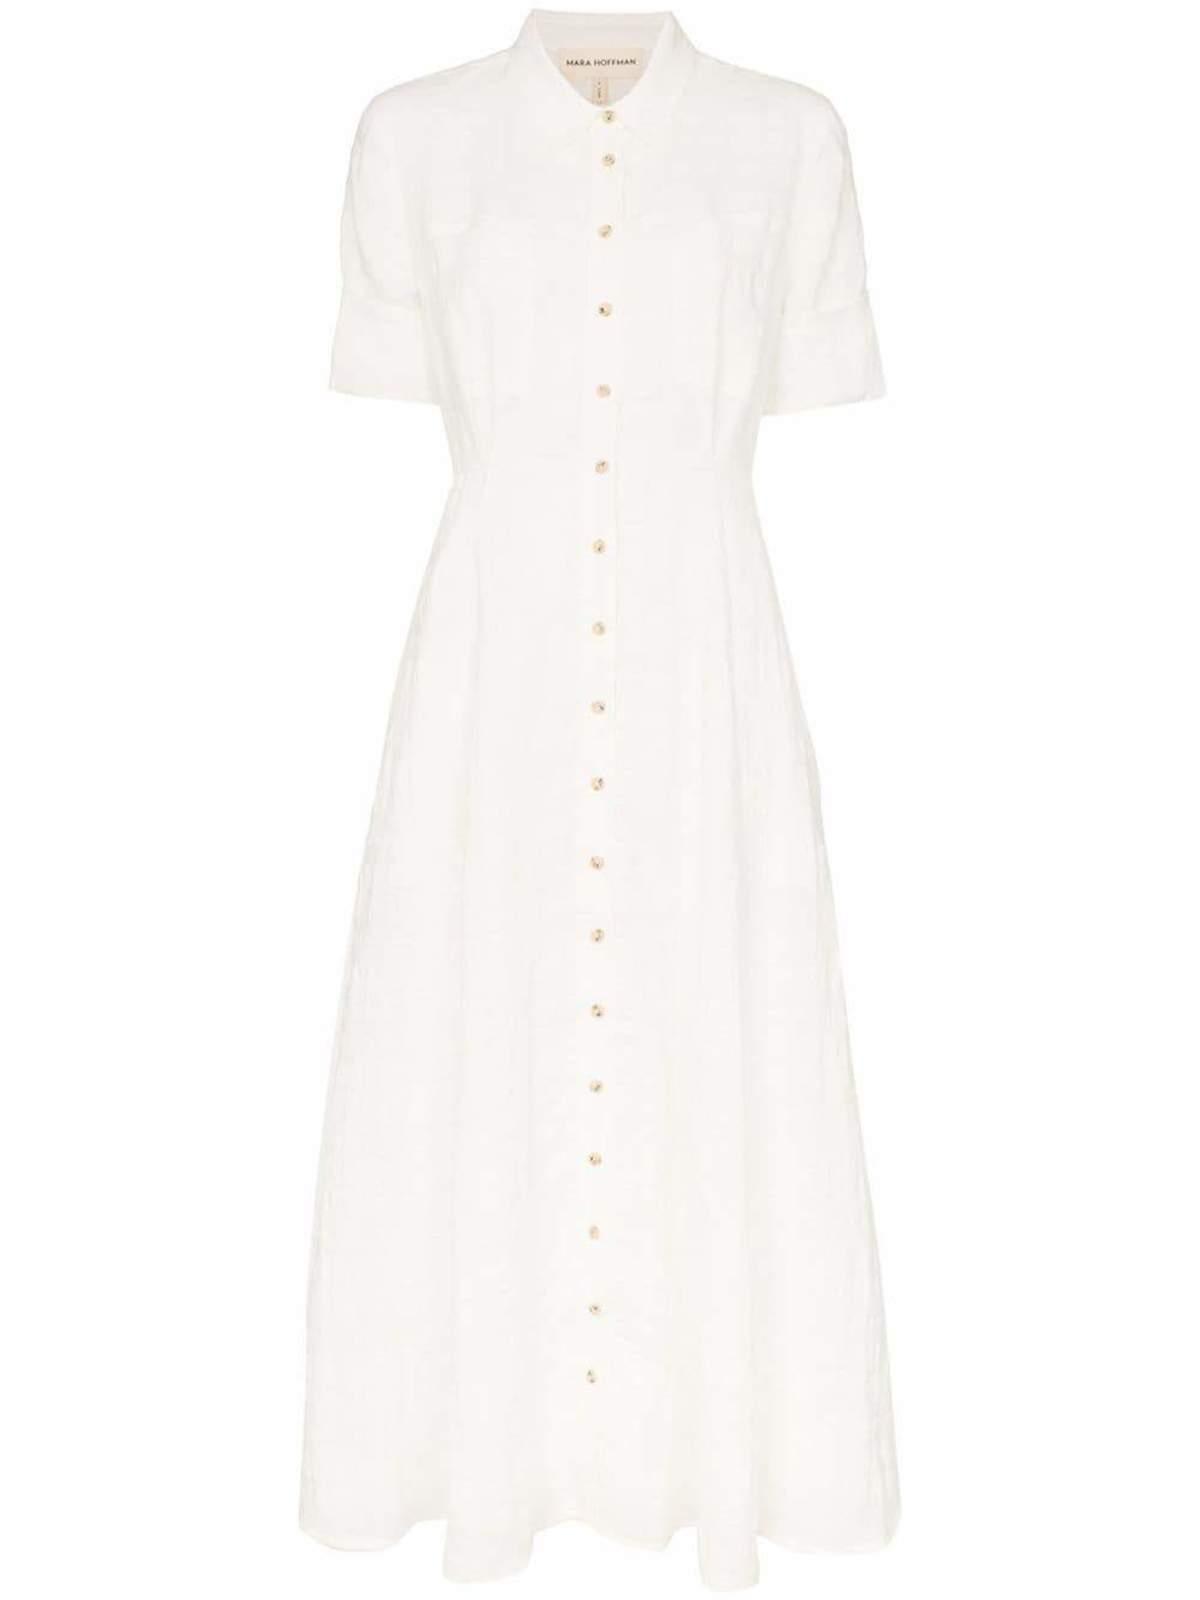 98a5fc68bc74 MARA HOFFMAN Lorelei Short Sleeve Button Front Dress - WHITE ...